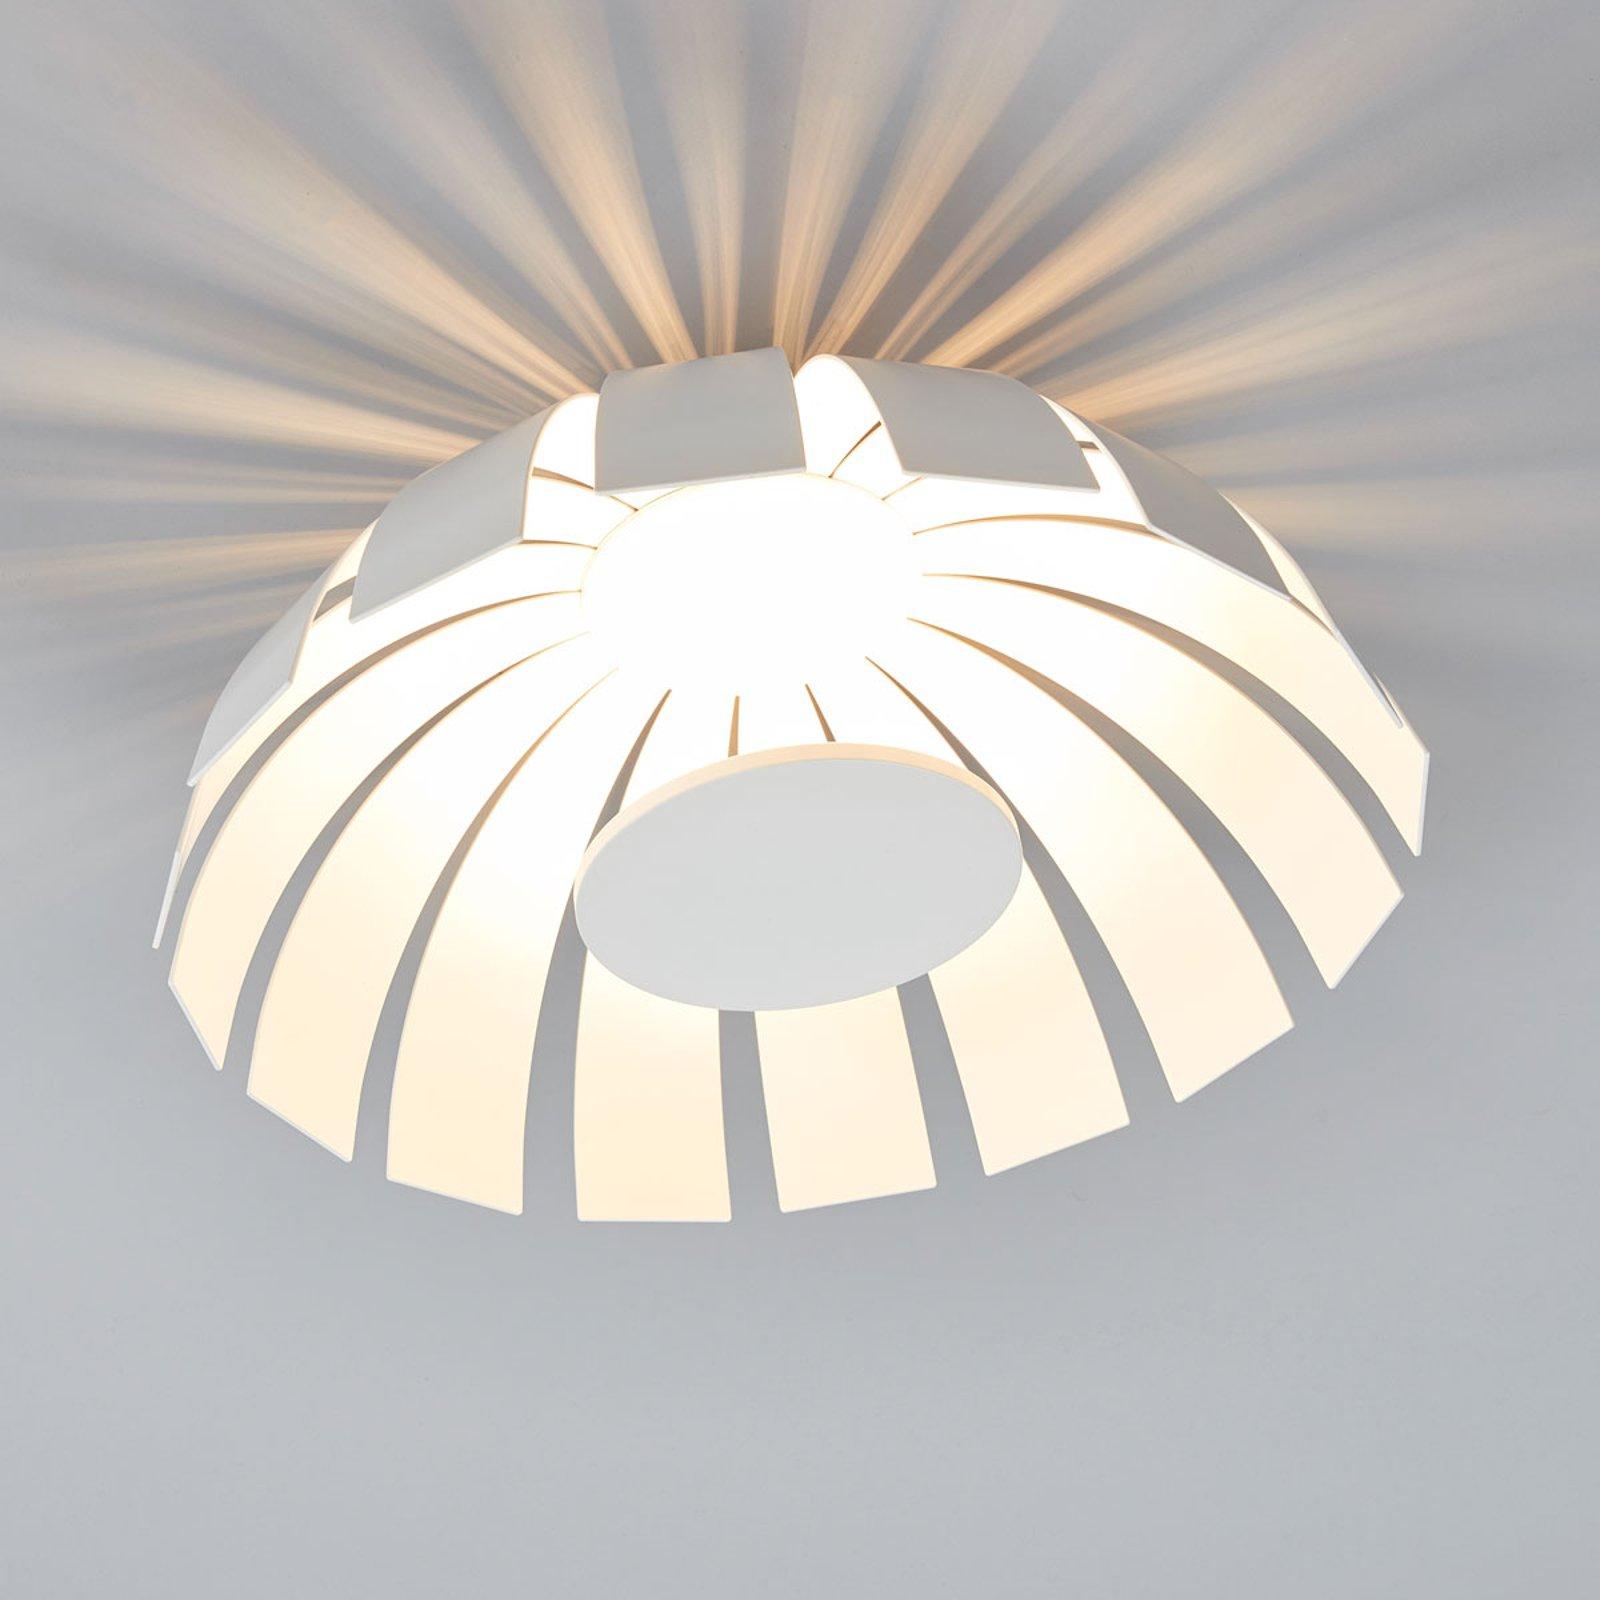 Hvit LED-designertaklampe Loto. 33 cm